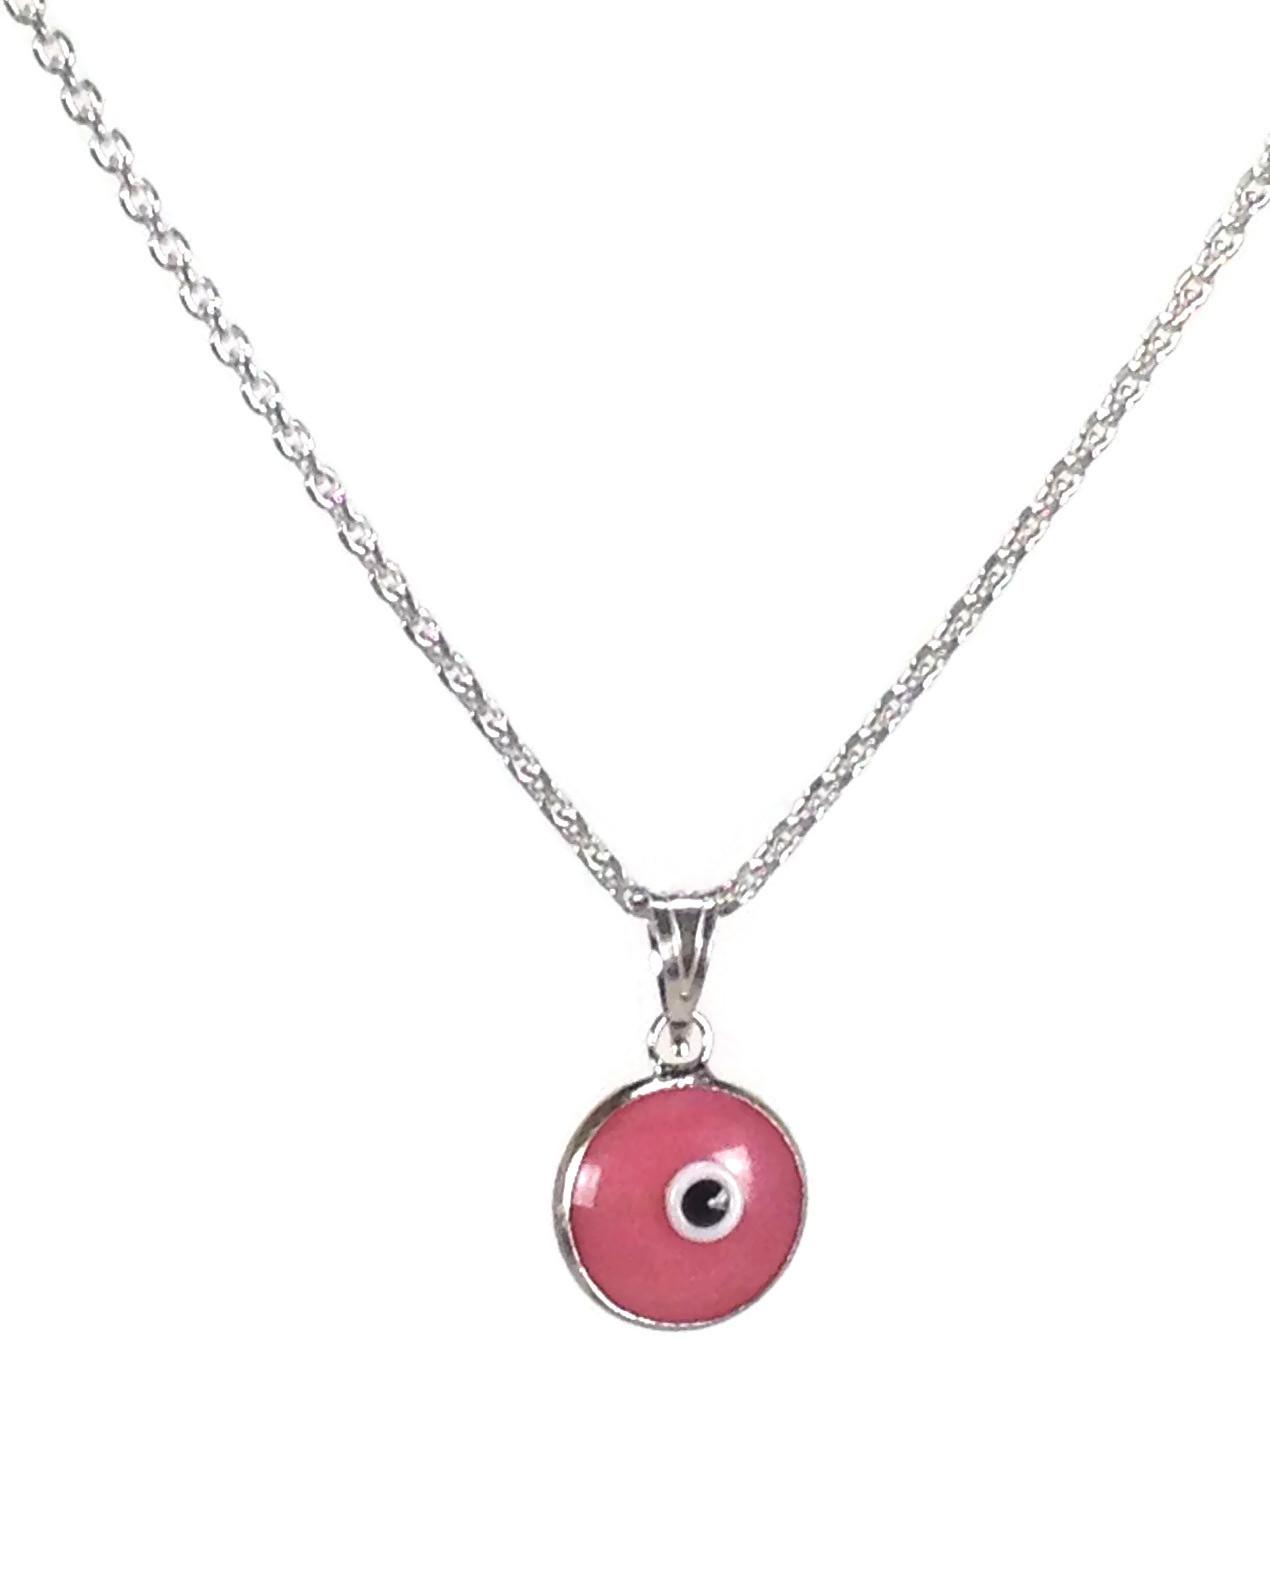 pink evil eye pendant necklace